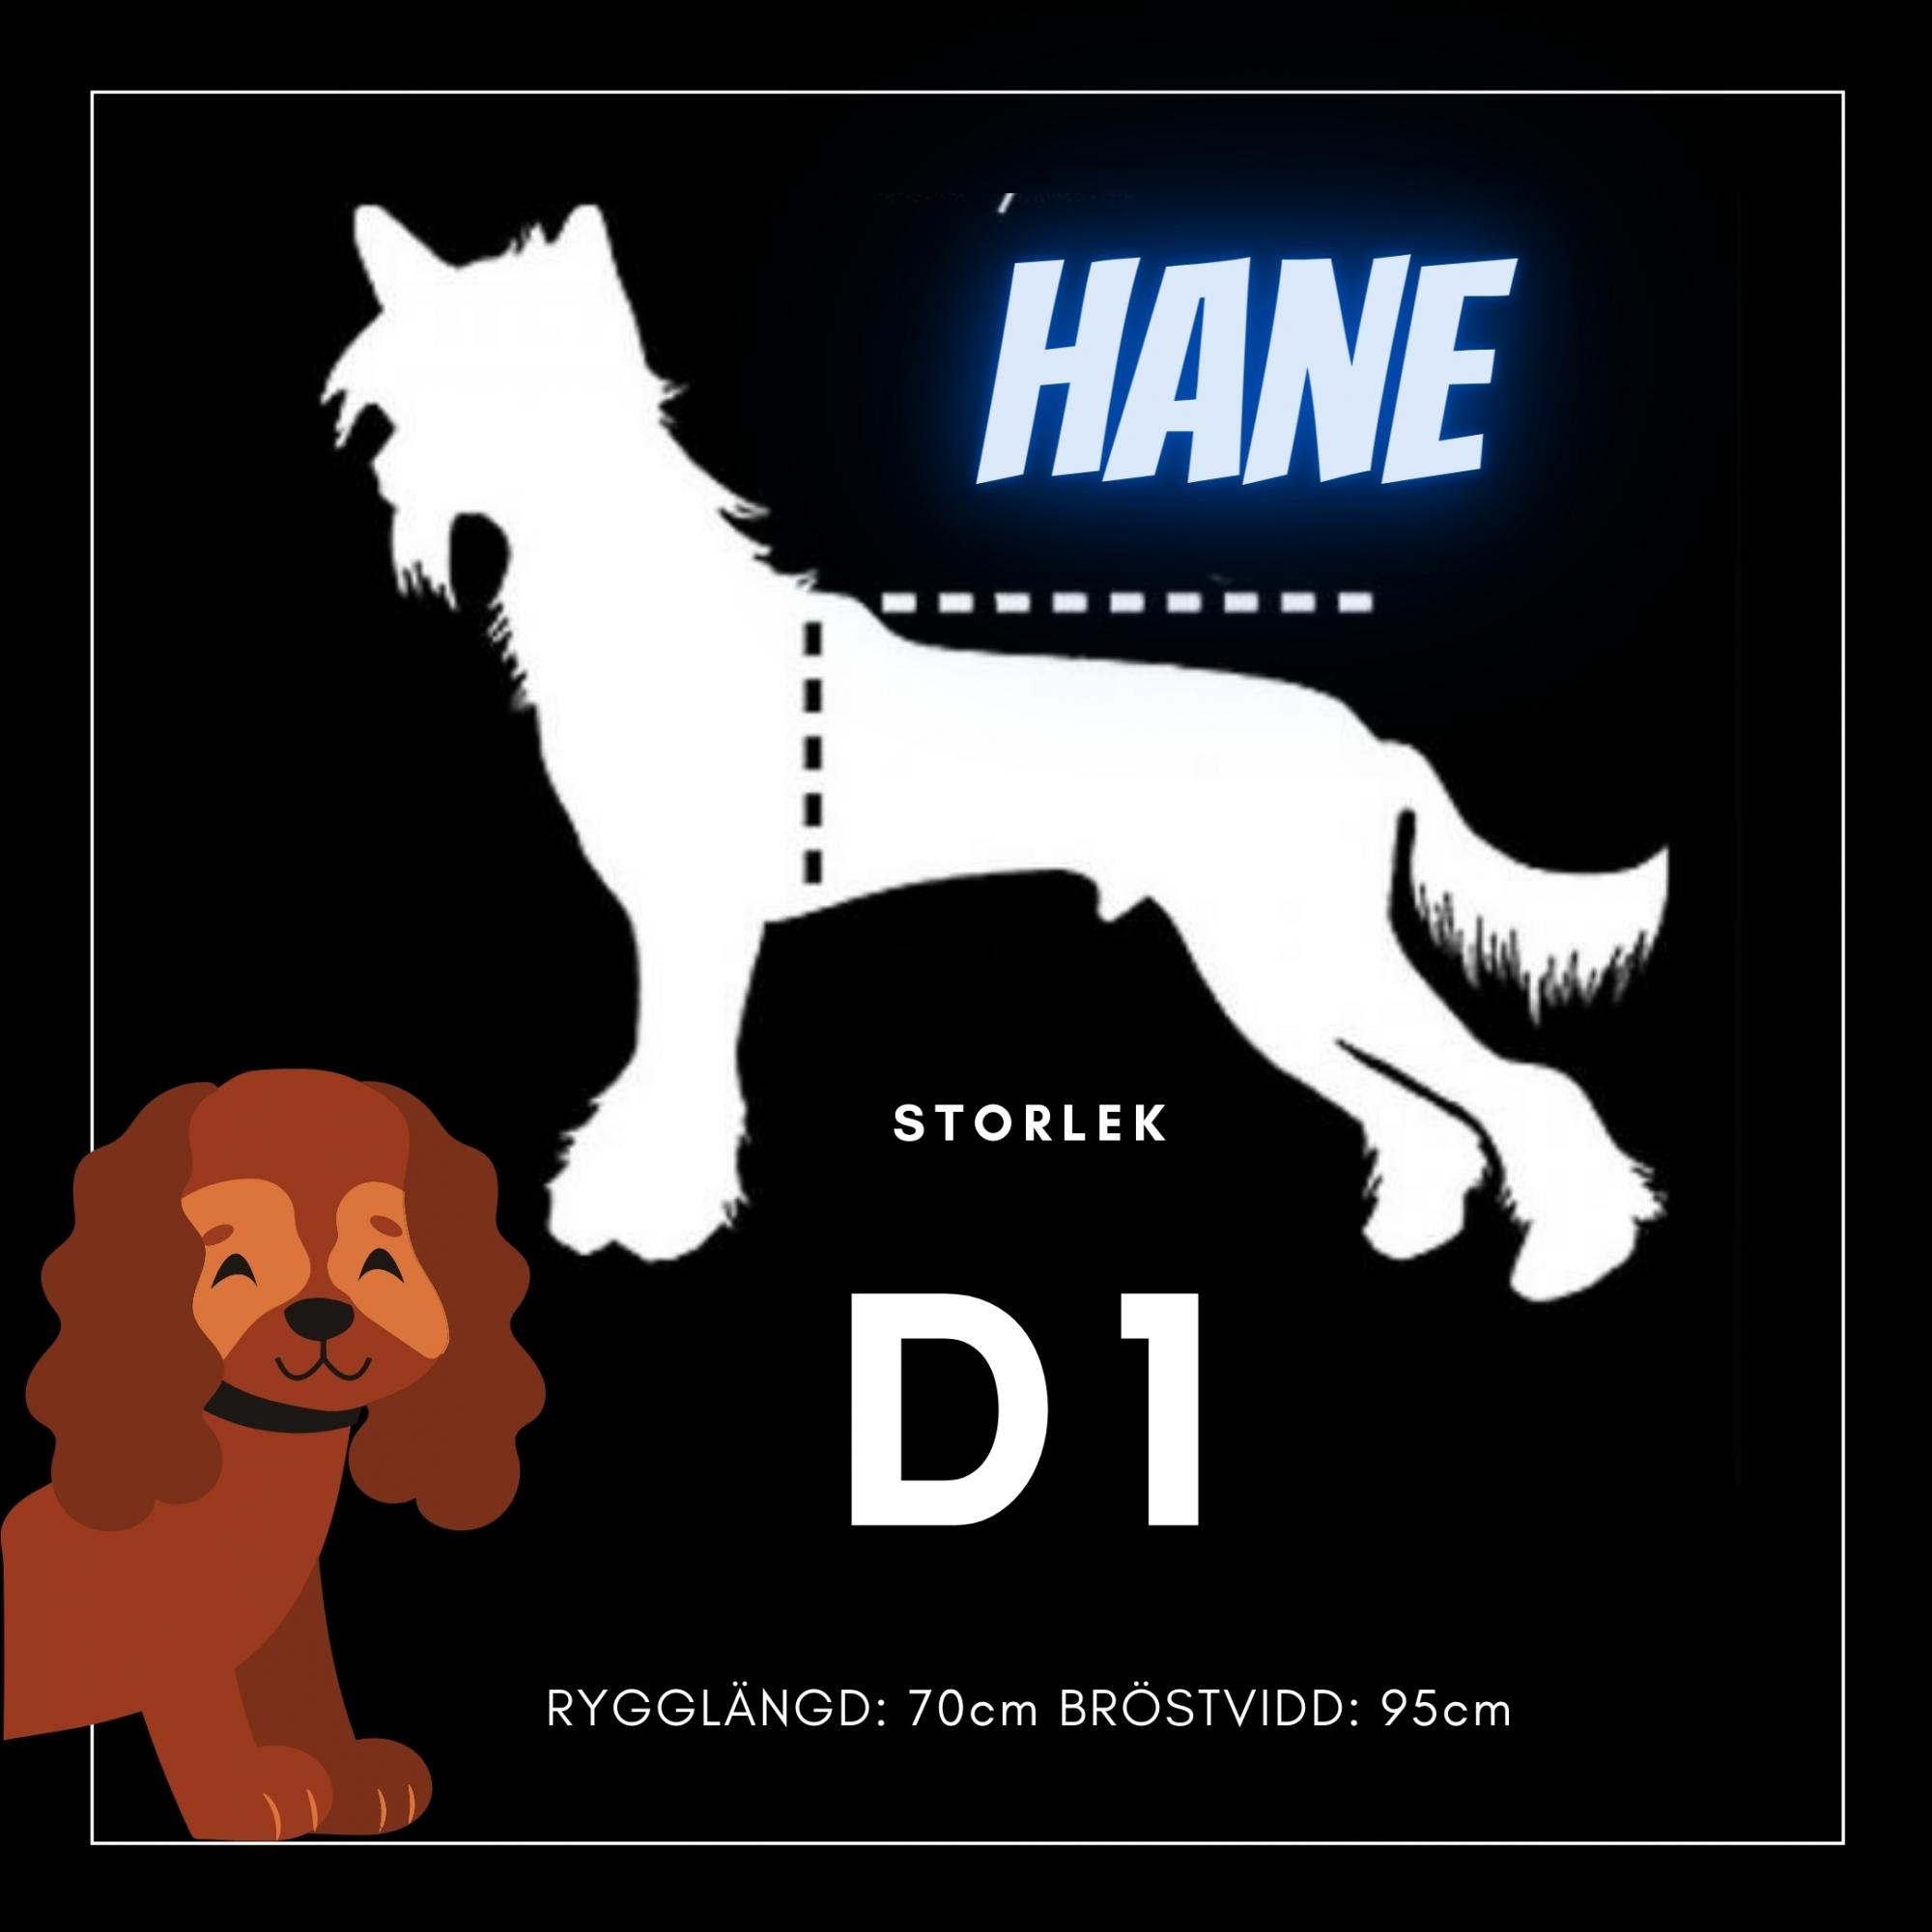 Hane Storlek D1 - Passion For Pet Fashion